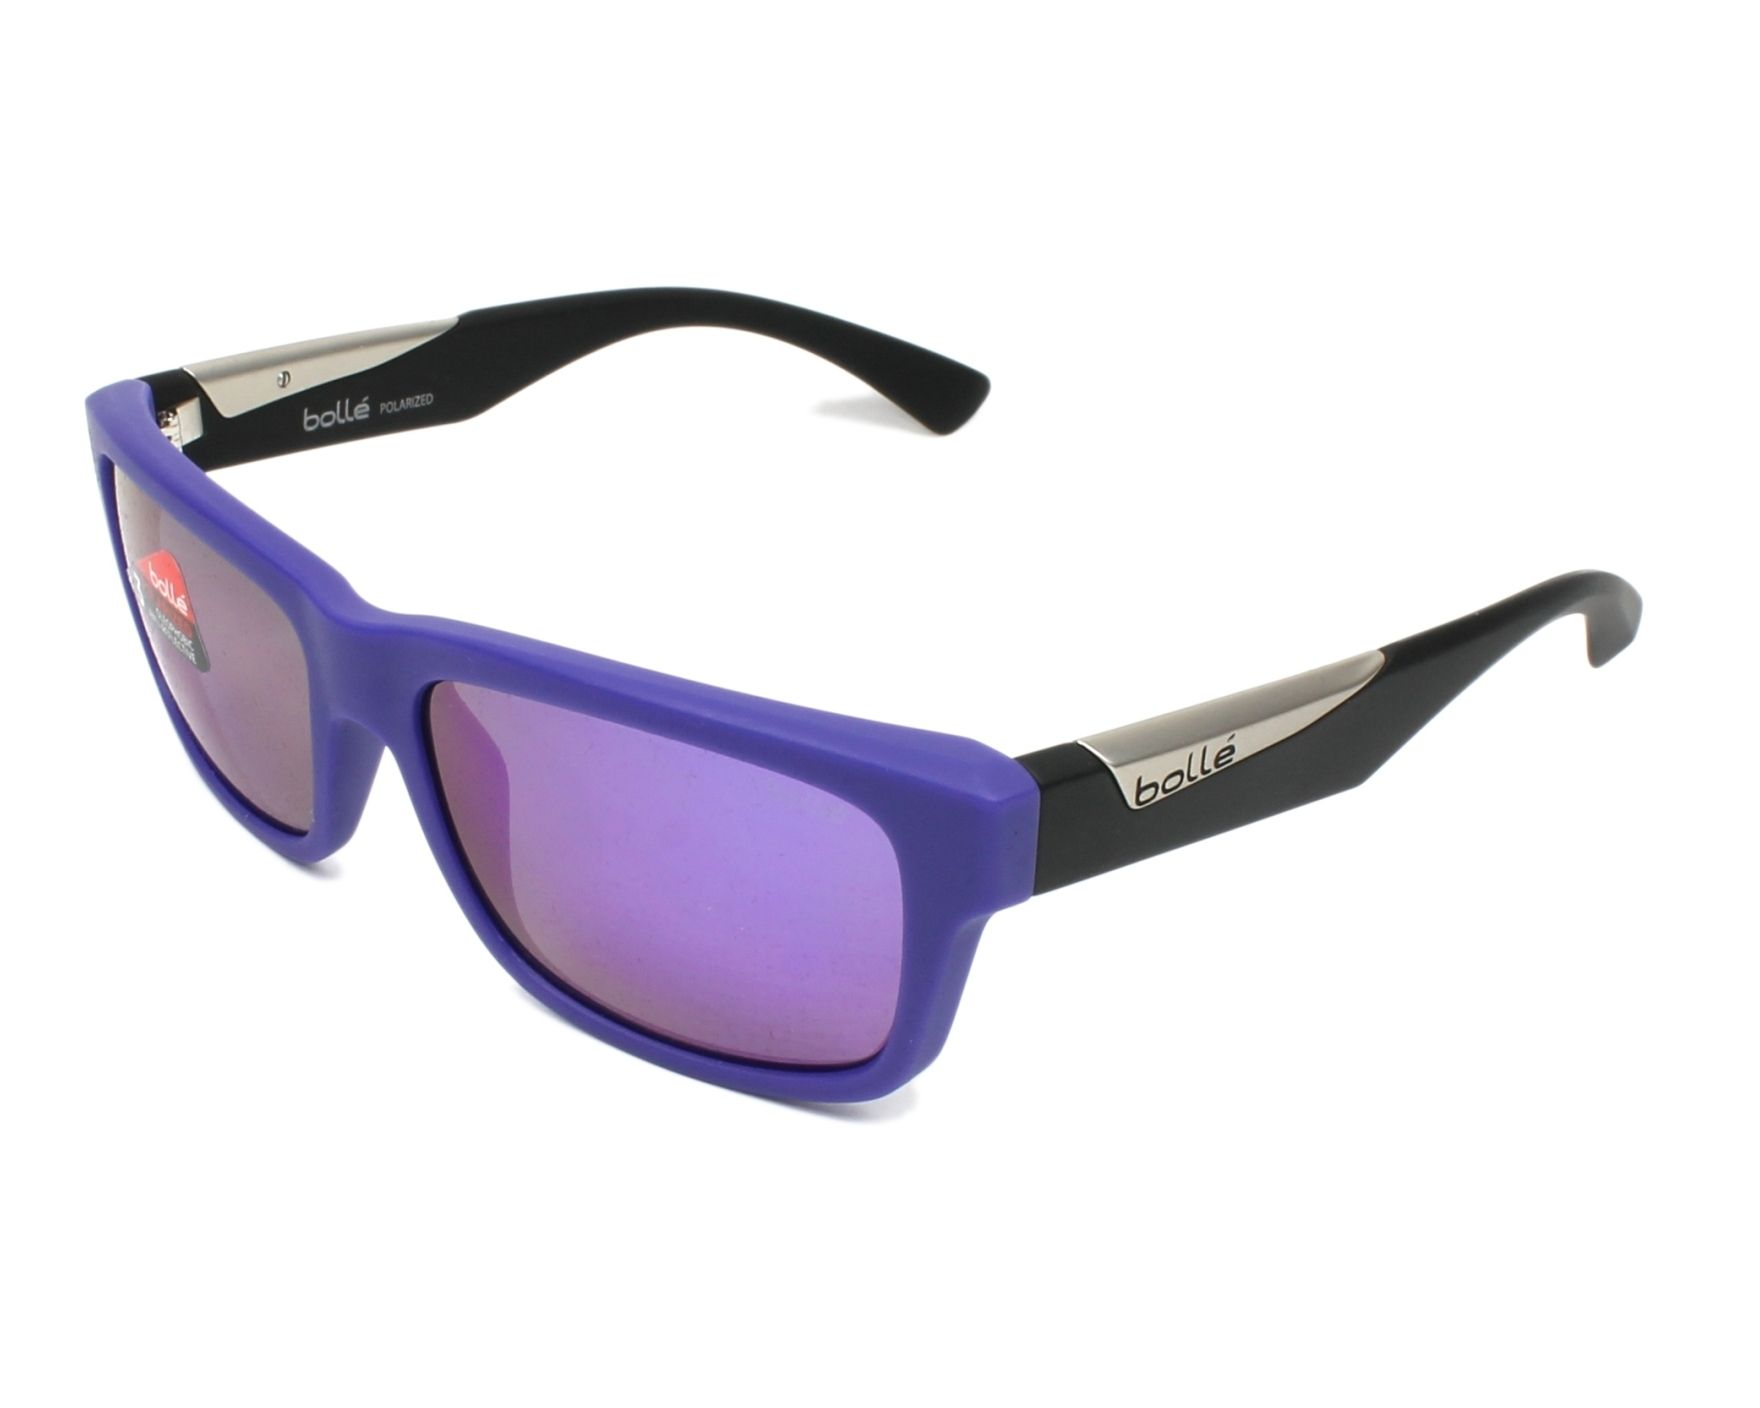 b54f8da5a5 Gafas de sol Bollé JUDE 12114 56-18 Lila Negra vista de perfil